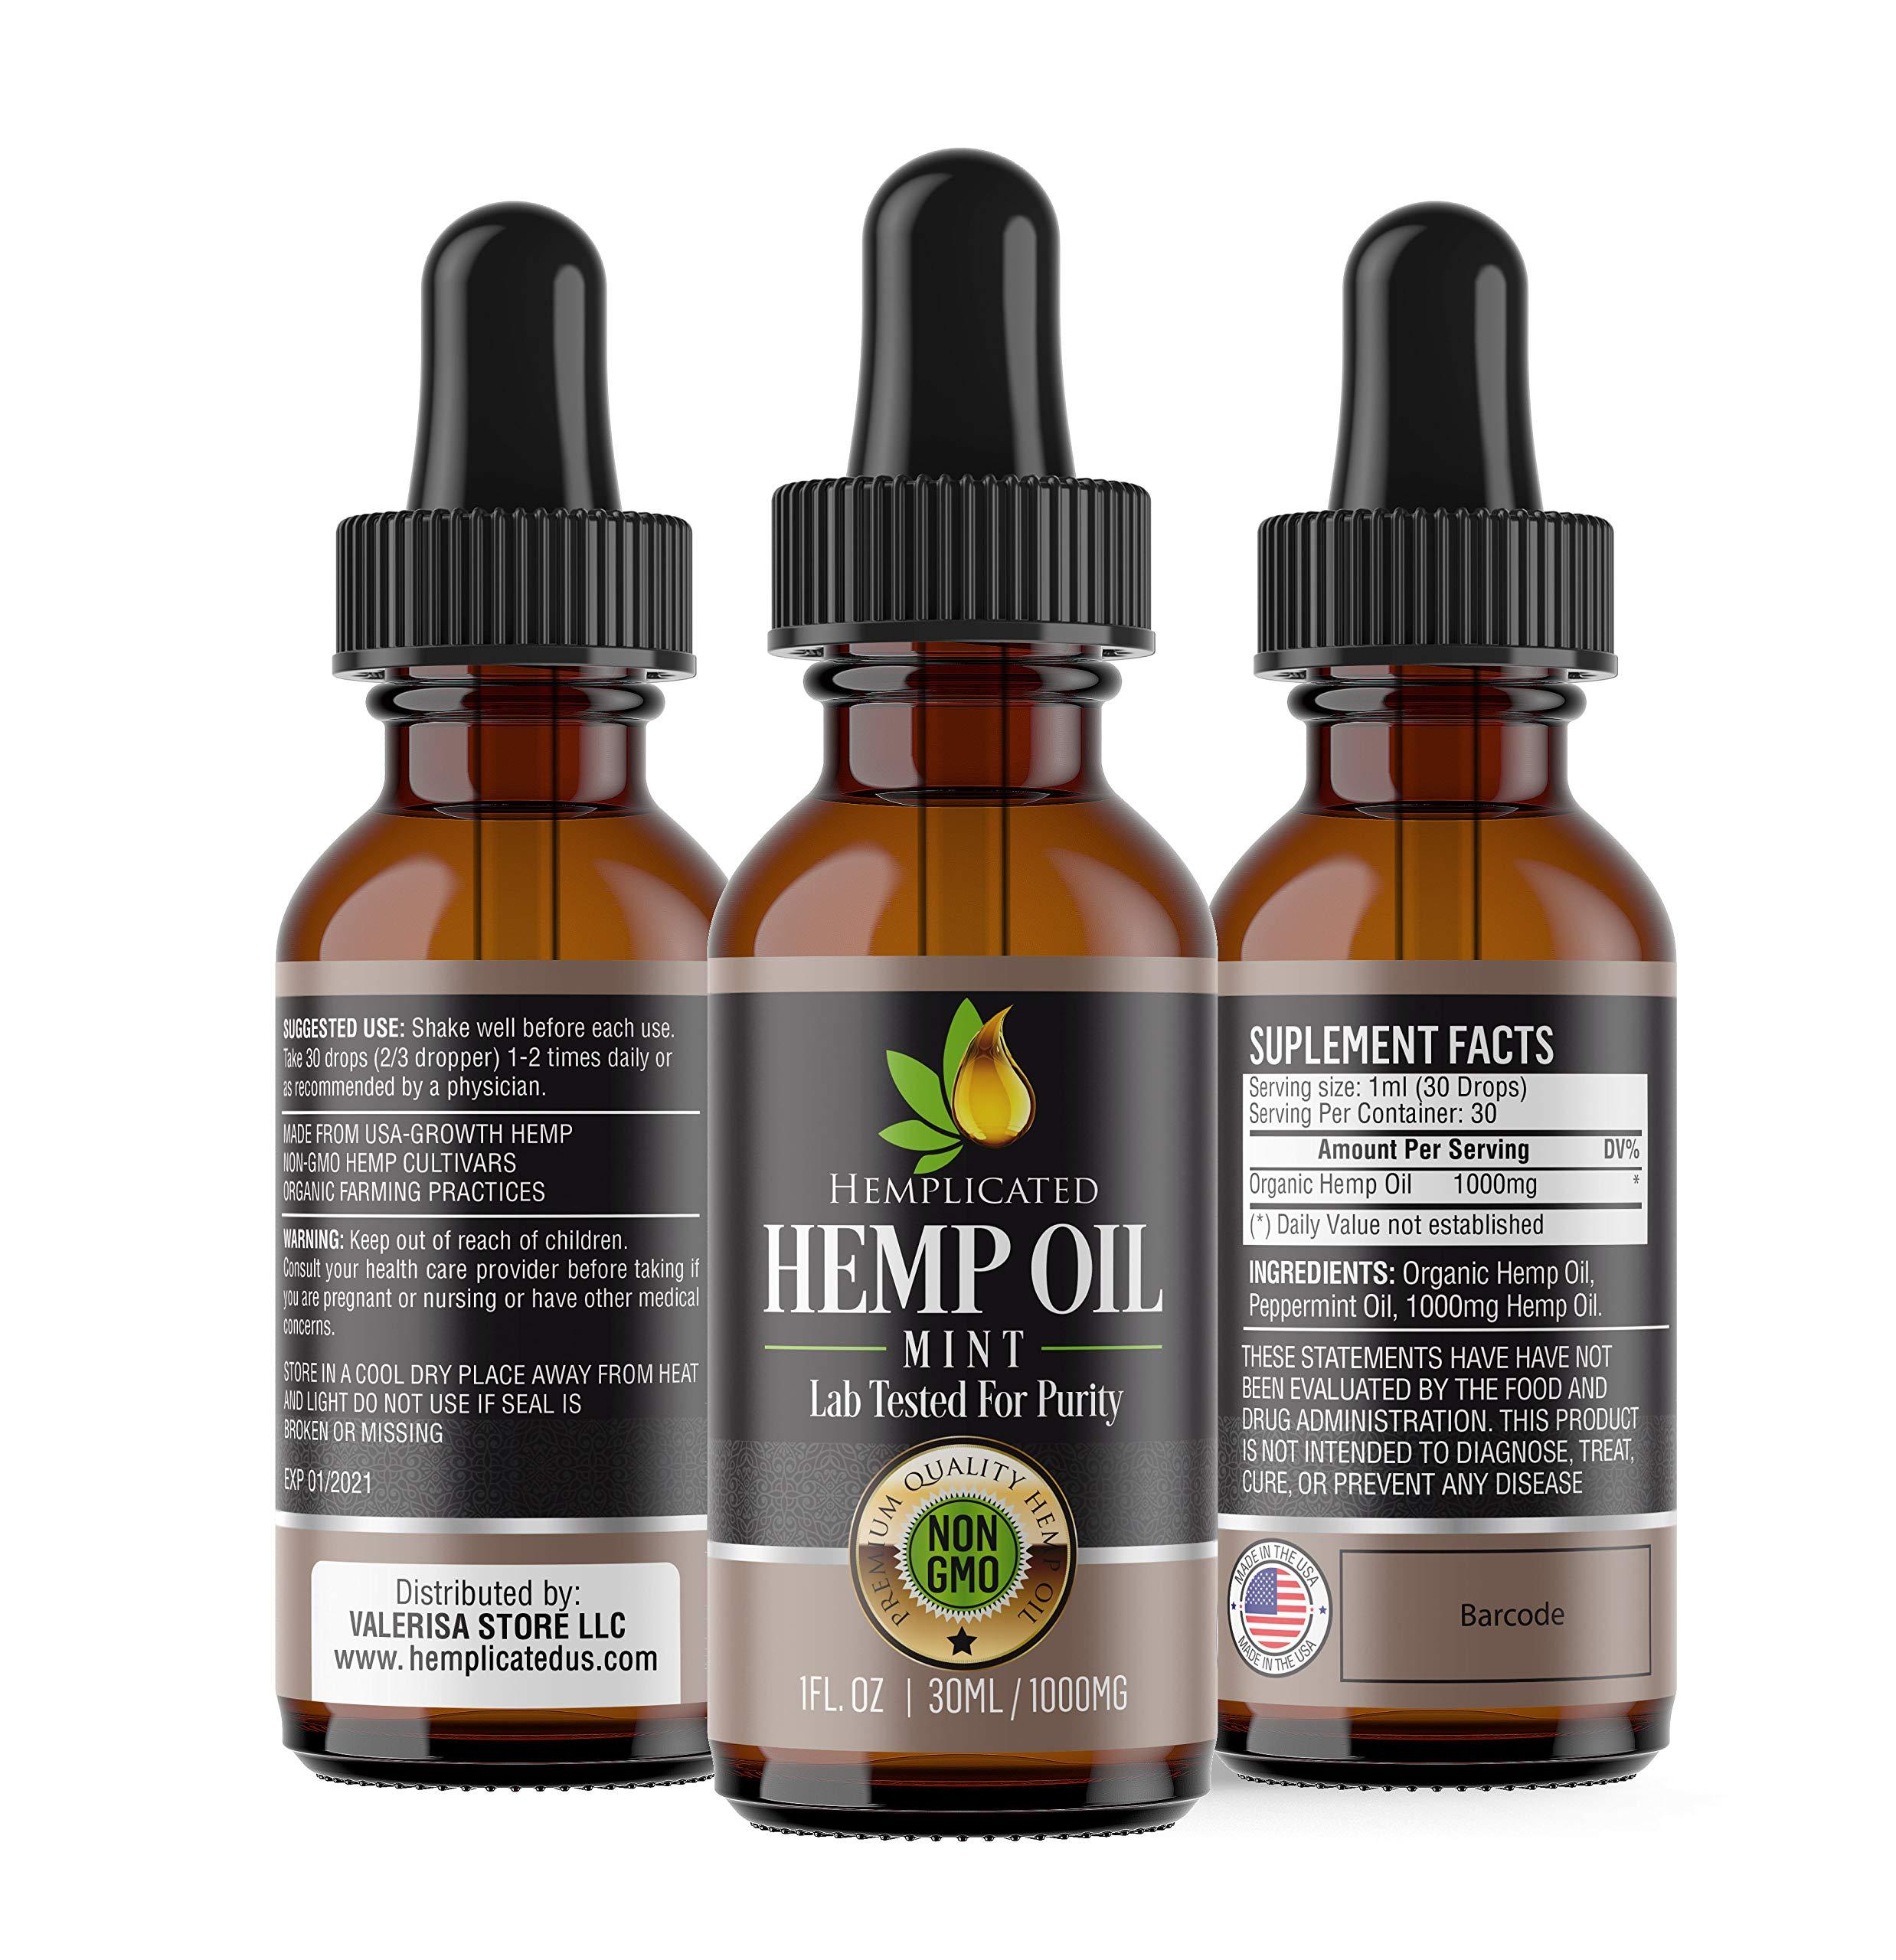 Hemp Oil 1000mg for Pain Relief, Stress Relief, Anti Anxiety, Sleep Aid, PTSD, Skin and Hair - Organic Drops from Certified USA Growth Hemp Farms - 1 Fl Oz (30 ml) HEMPLICATED by HEMPLICATED